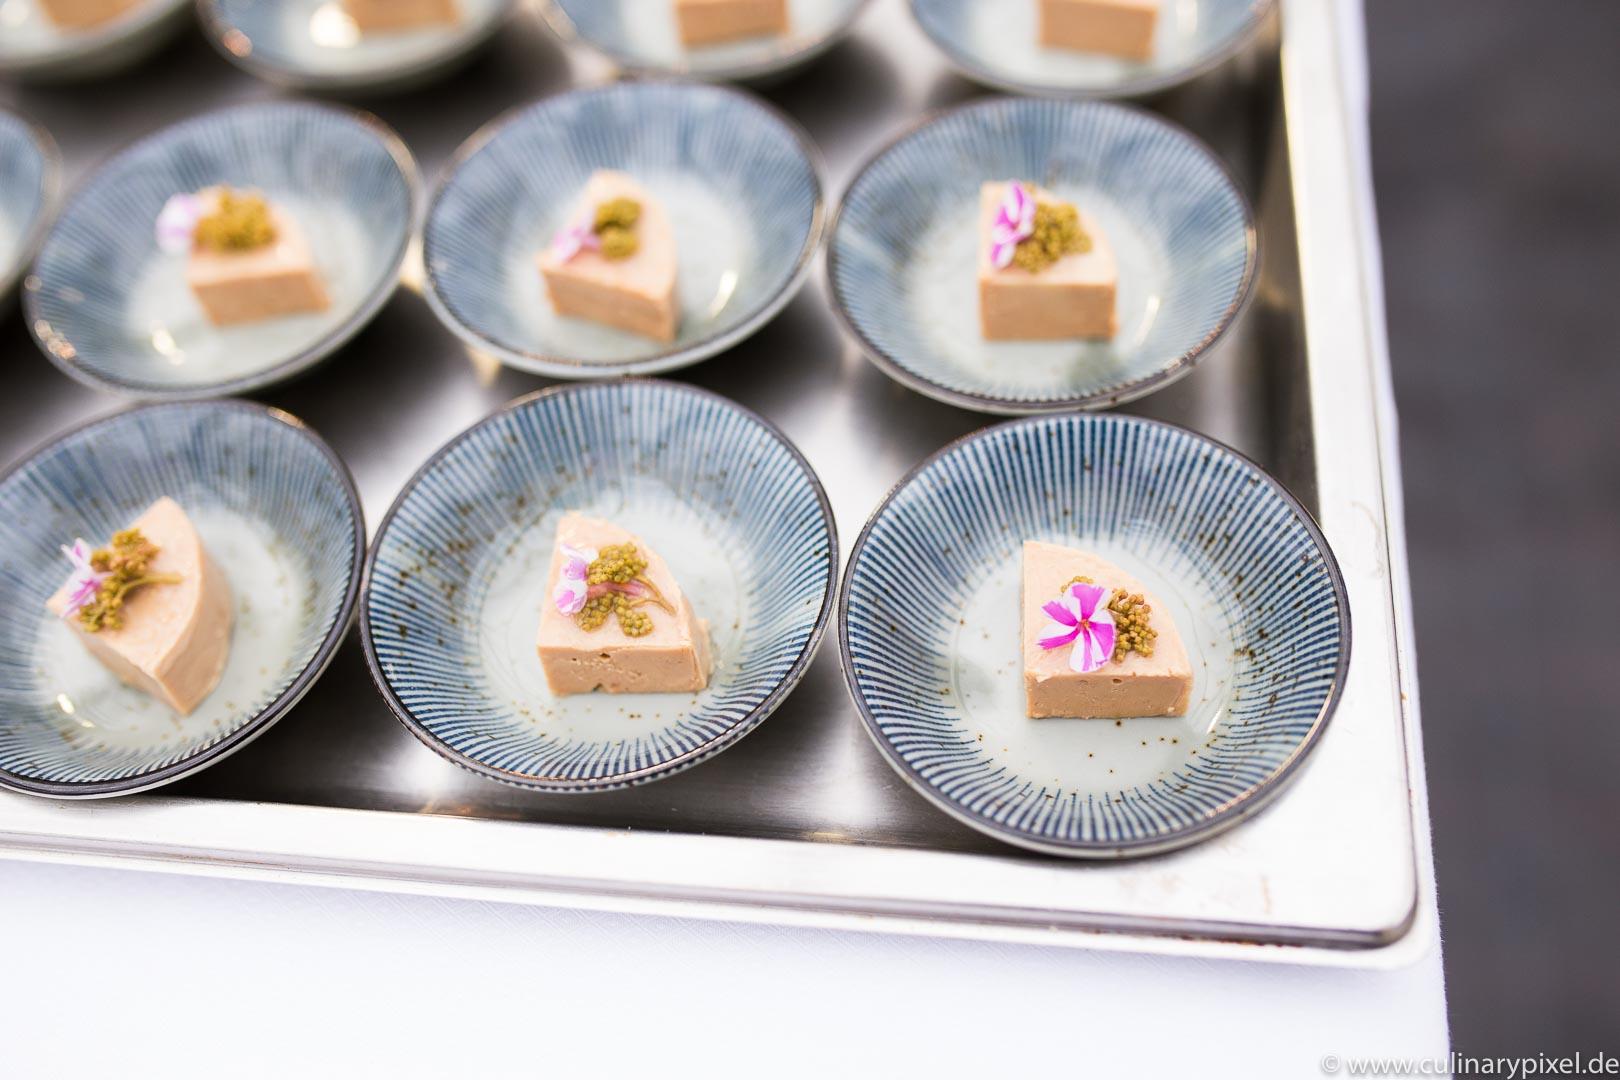 Tohru Nakamura Garden Table Geisels Werneckhof Entenleber